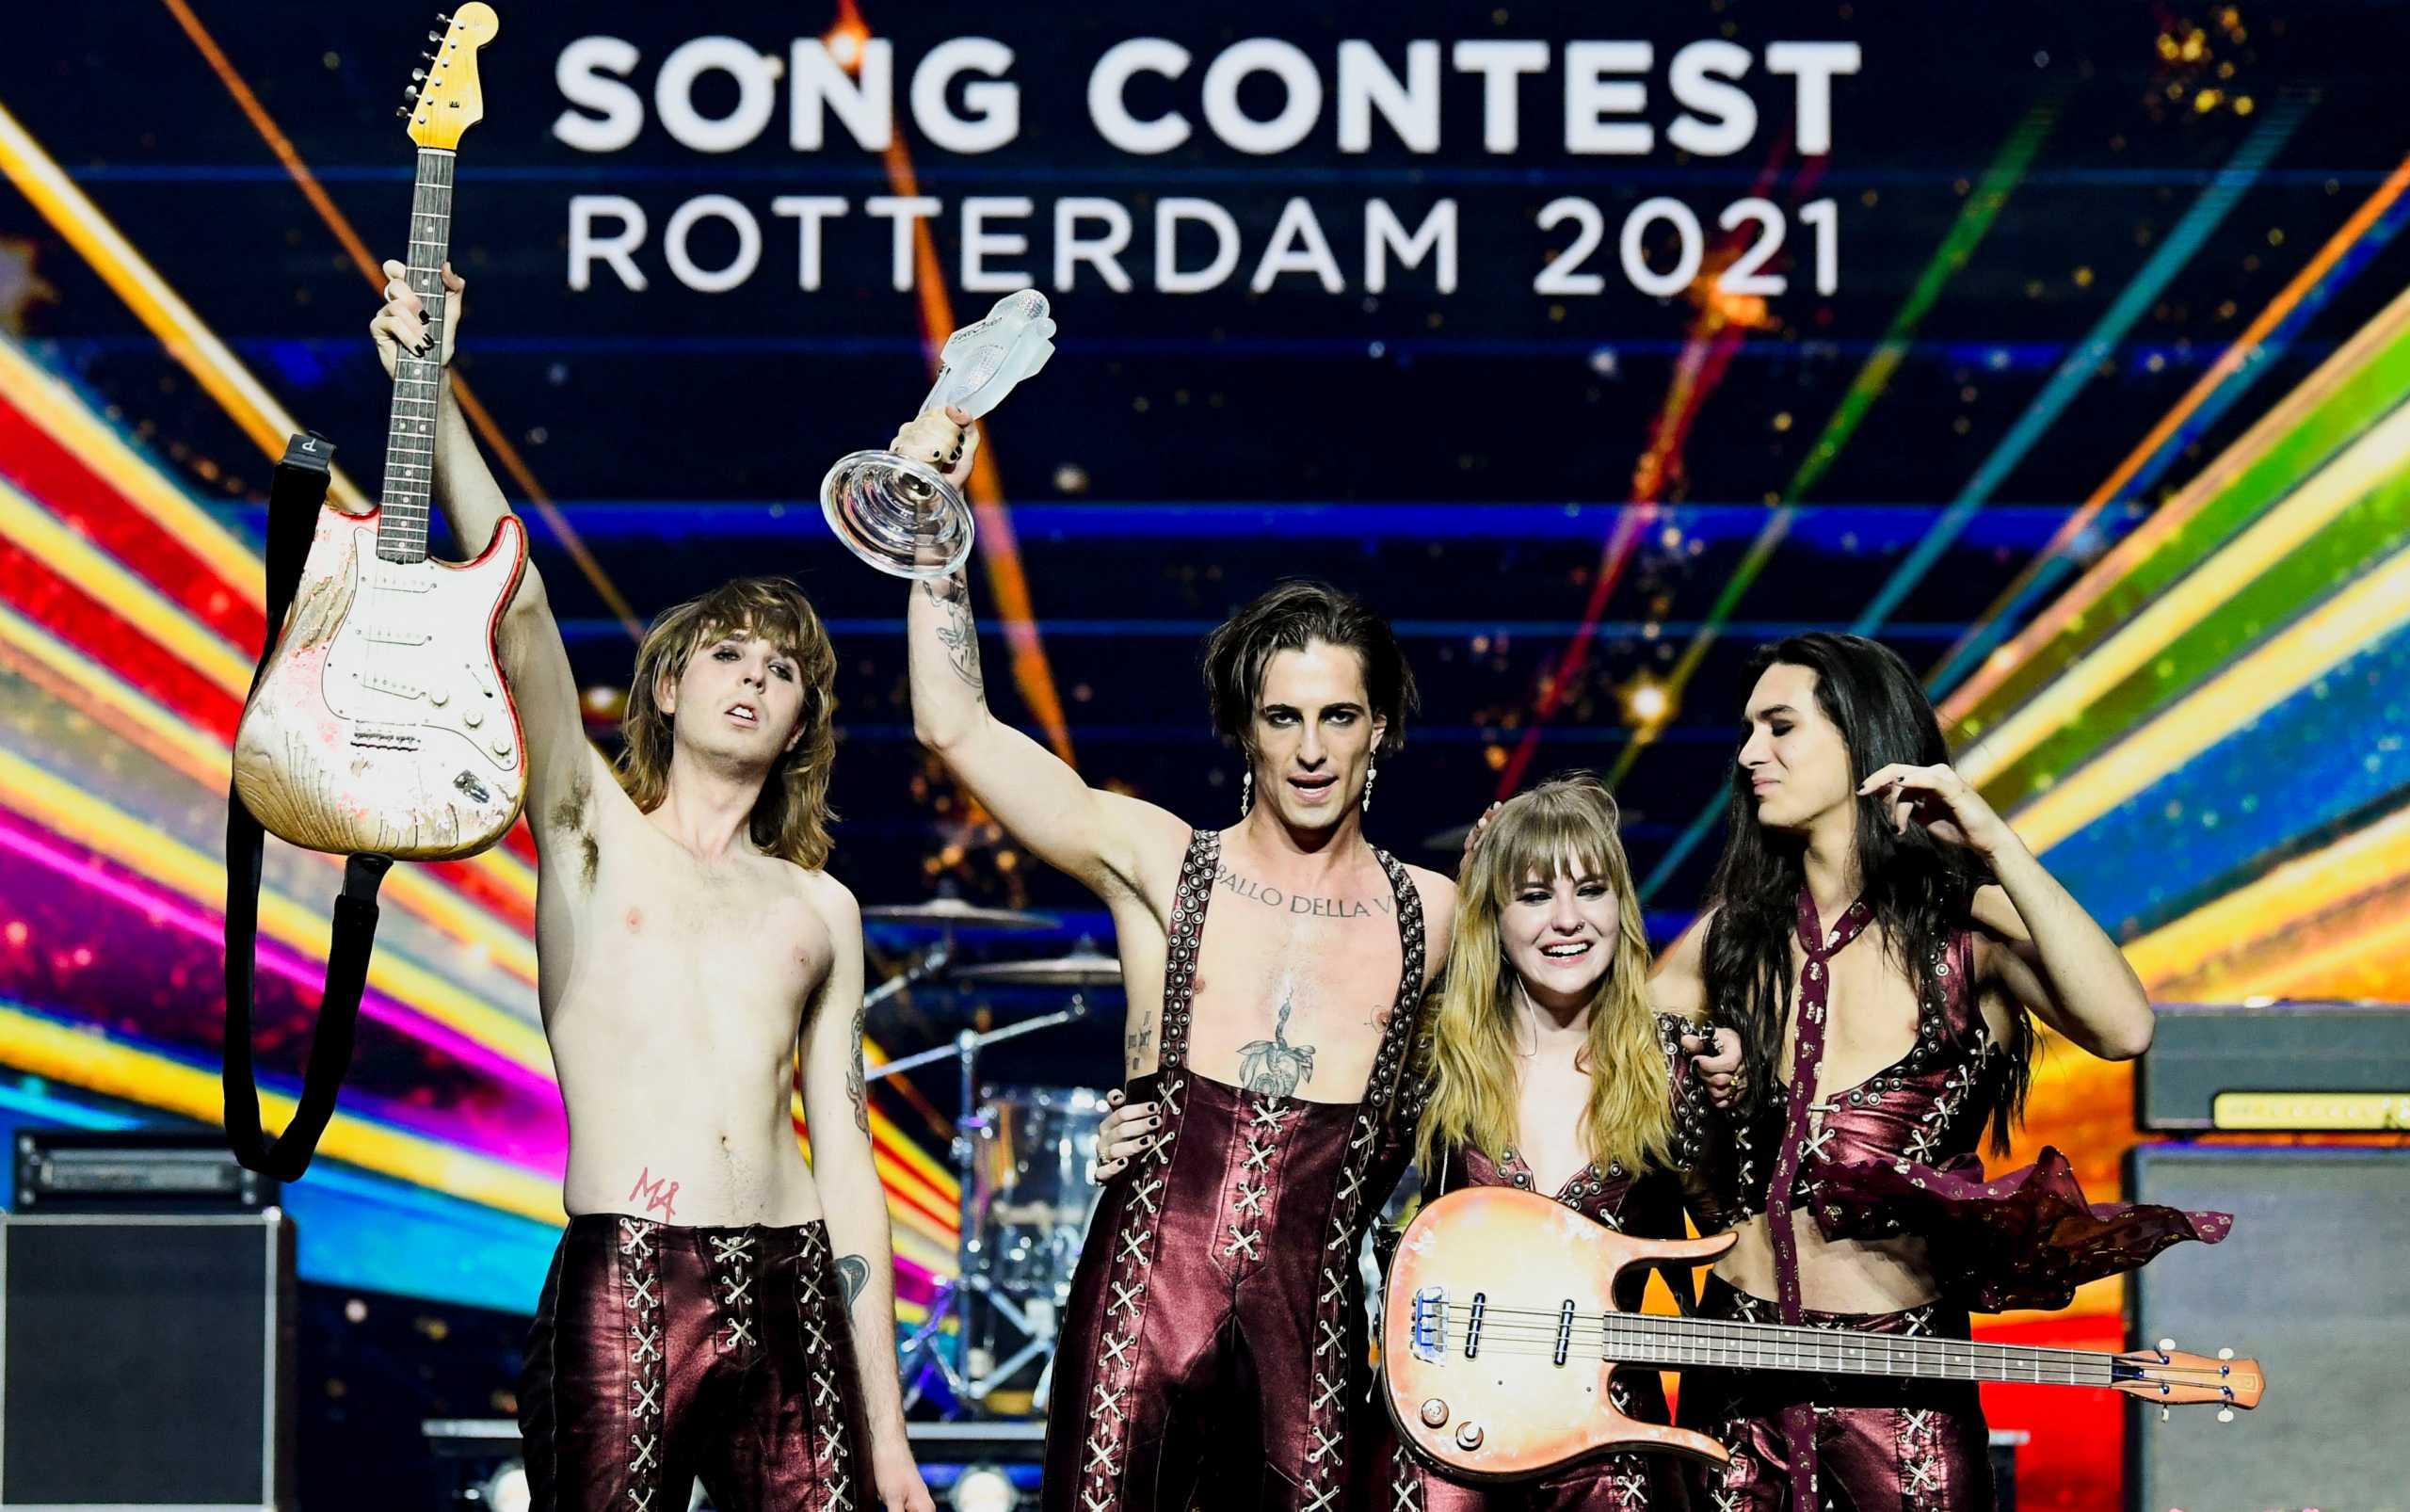 Eurovision 2021: Ανάρτηση «καρφί» του Damiano David στη Γαλλία μετά το αρνητικό αποτέλεσμα για τα ναρκωτικά